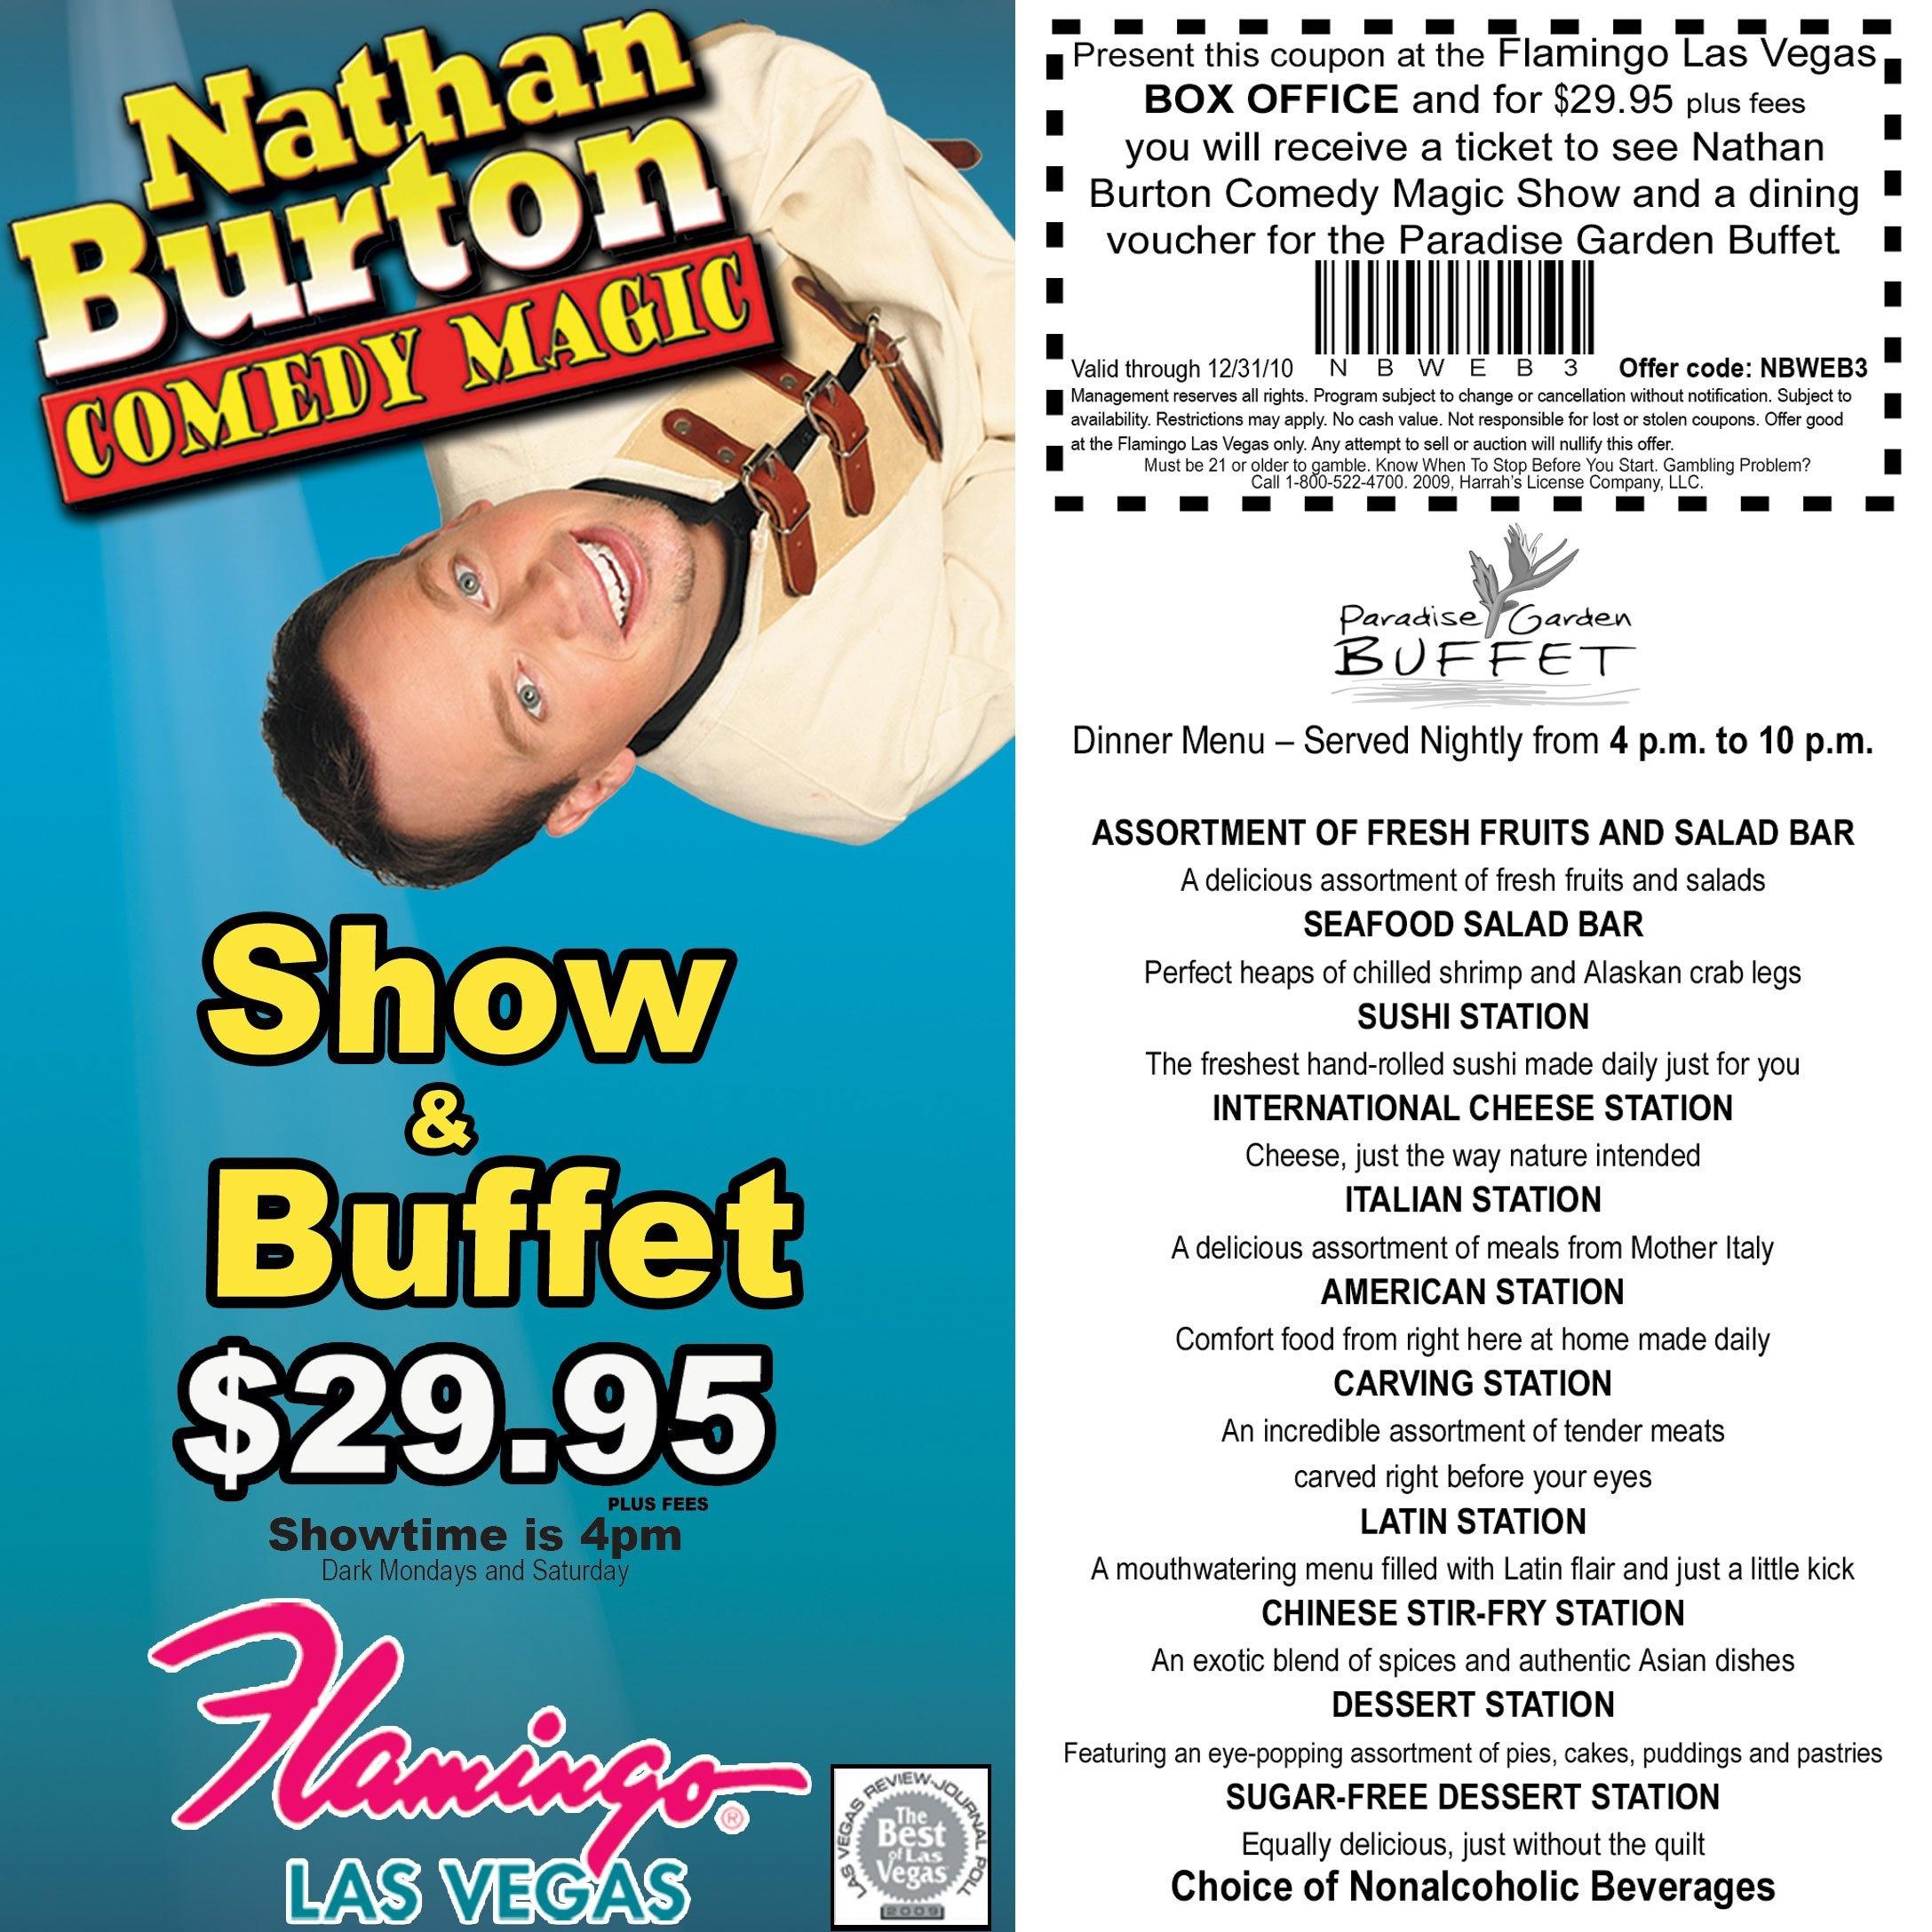 Las Vegas Coupons Buffet Printable | Architecture Technology & Design - Free Las Vegas Buffet Coupons Printable